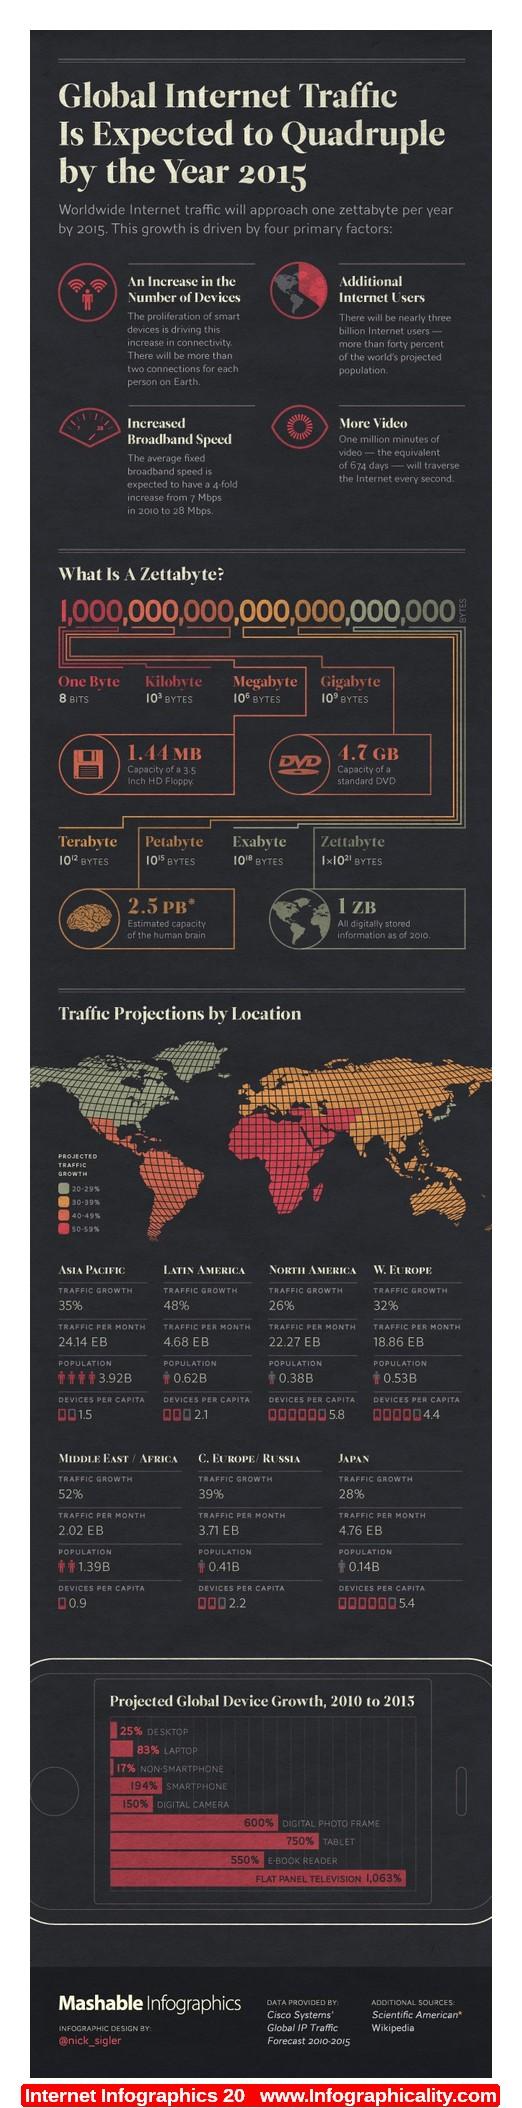 Global Internet Traffic 2015 #Infographic